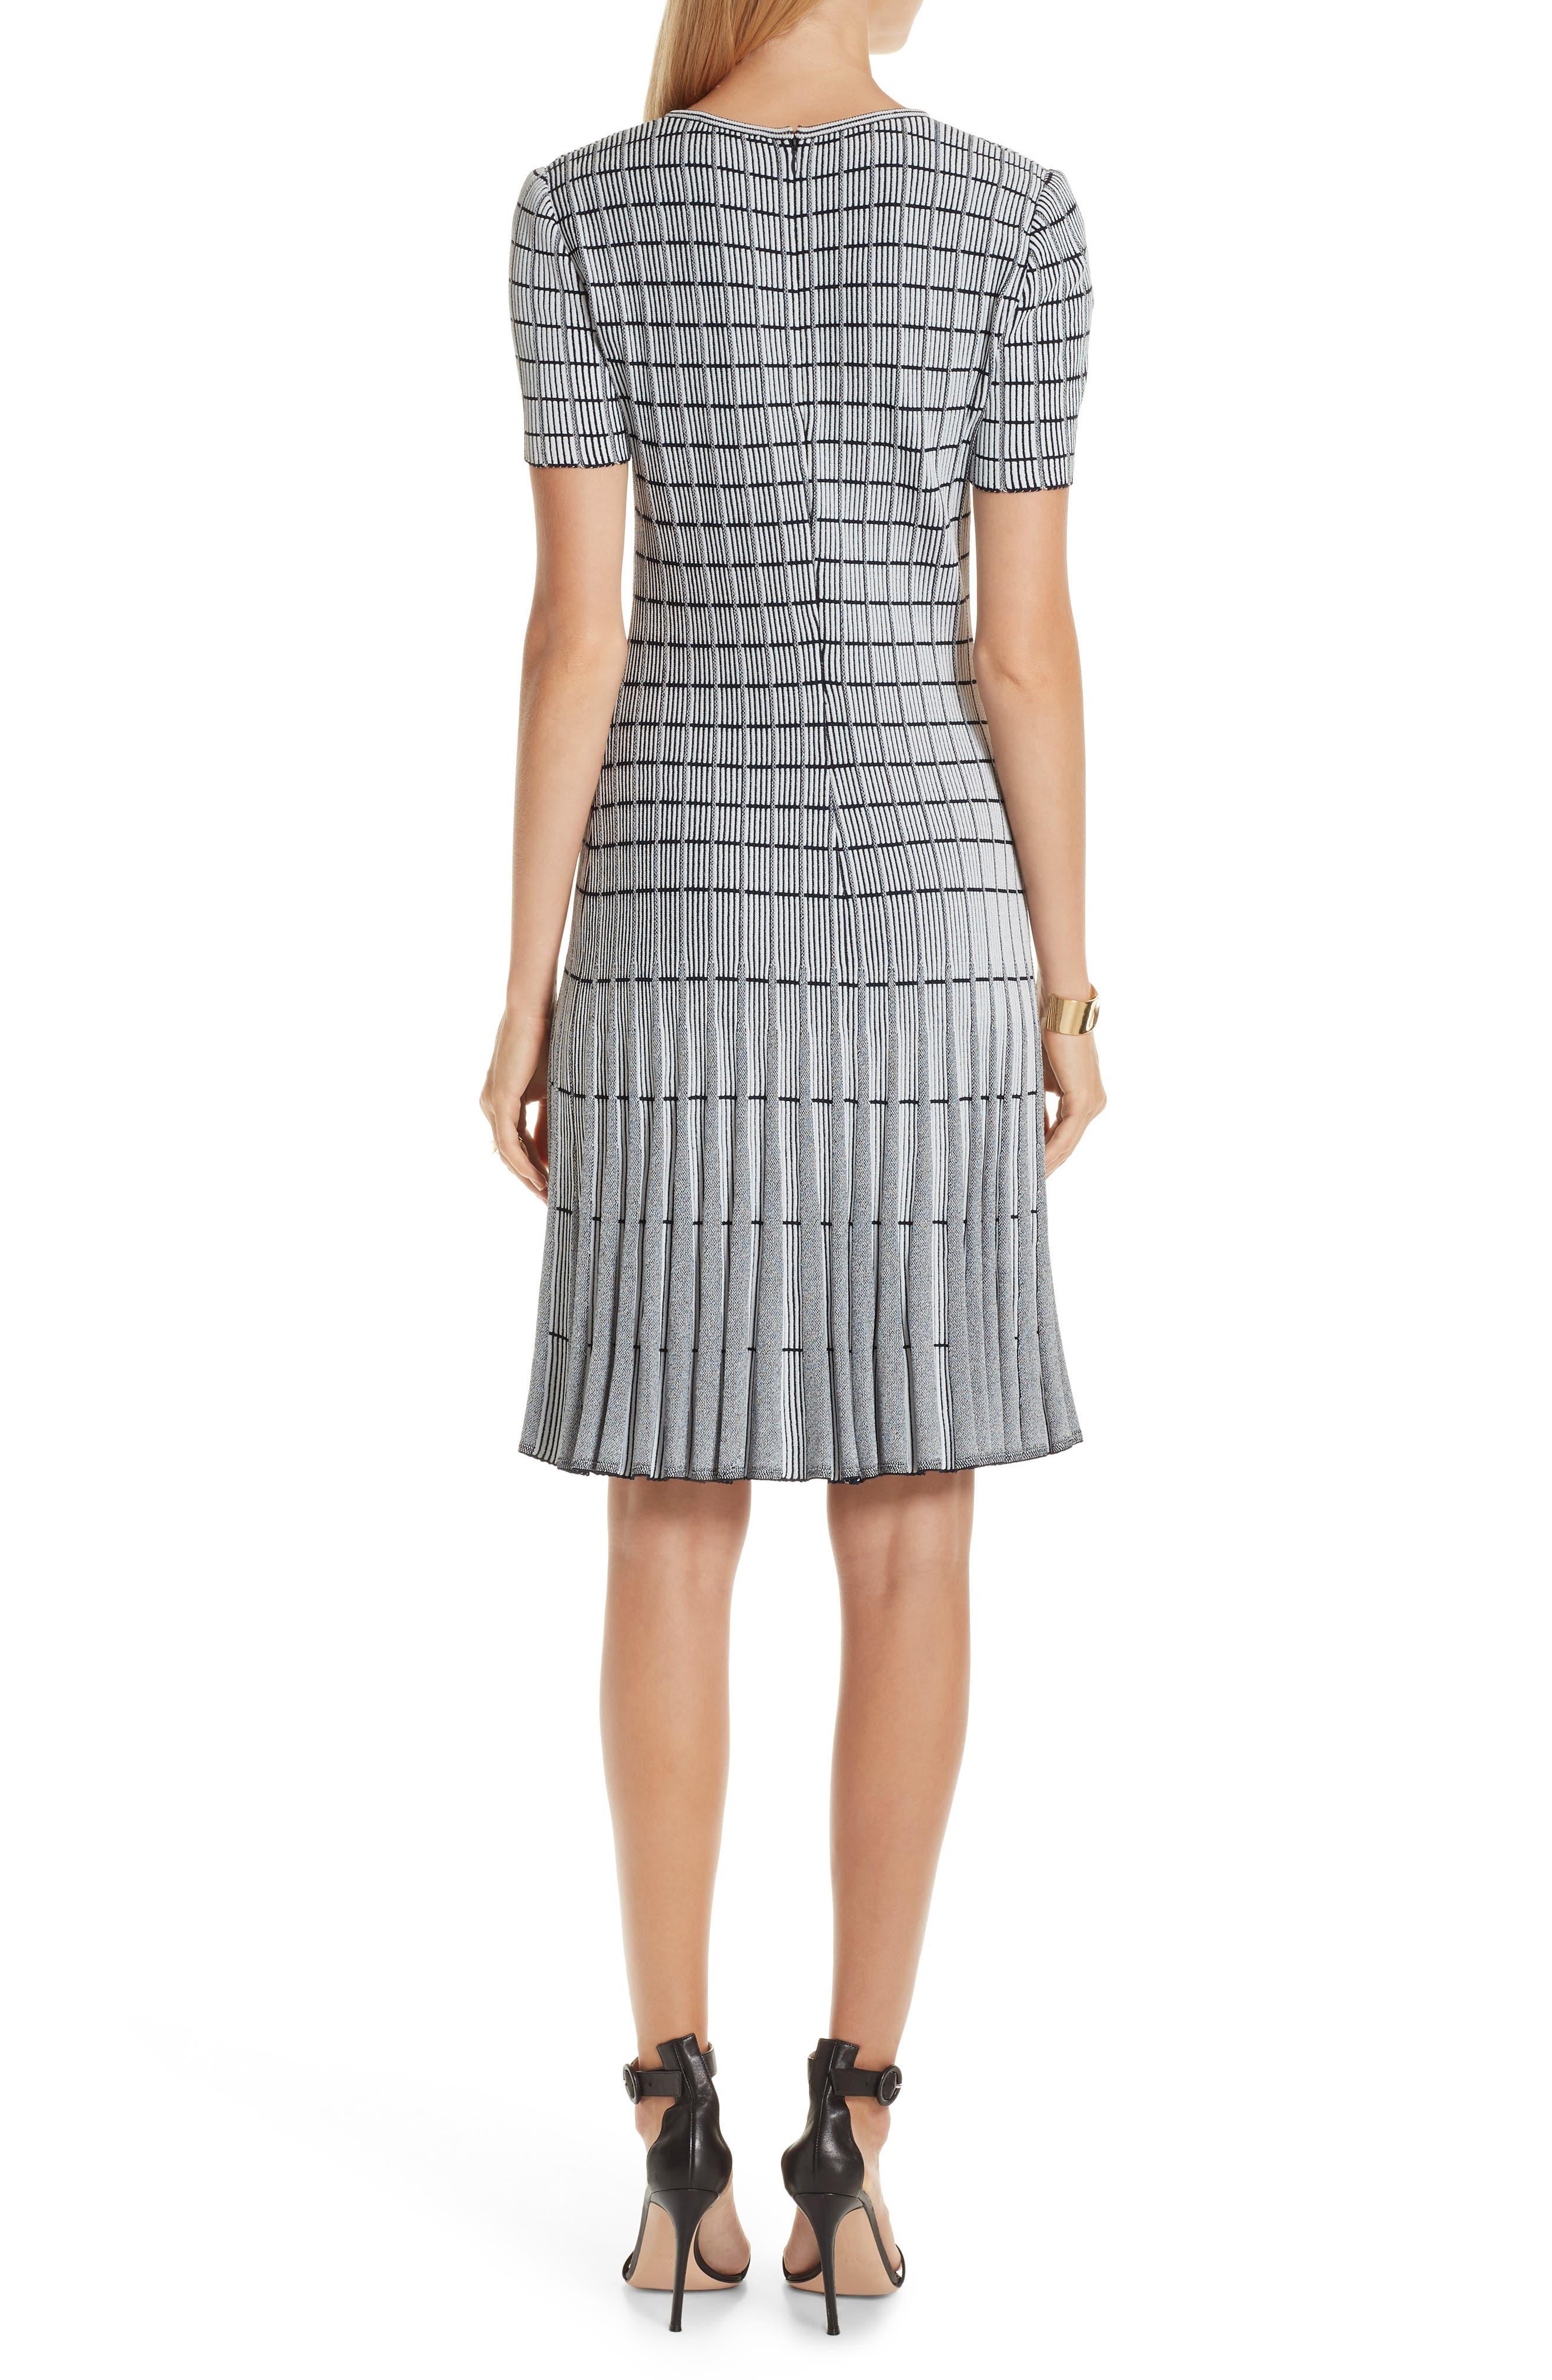 ST. JOHN COLLECTION, Monochrome Ottoman Knit Dress, Alternate thumbnail 2, color, GREY/ NAVY